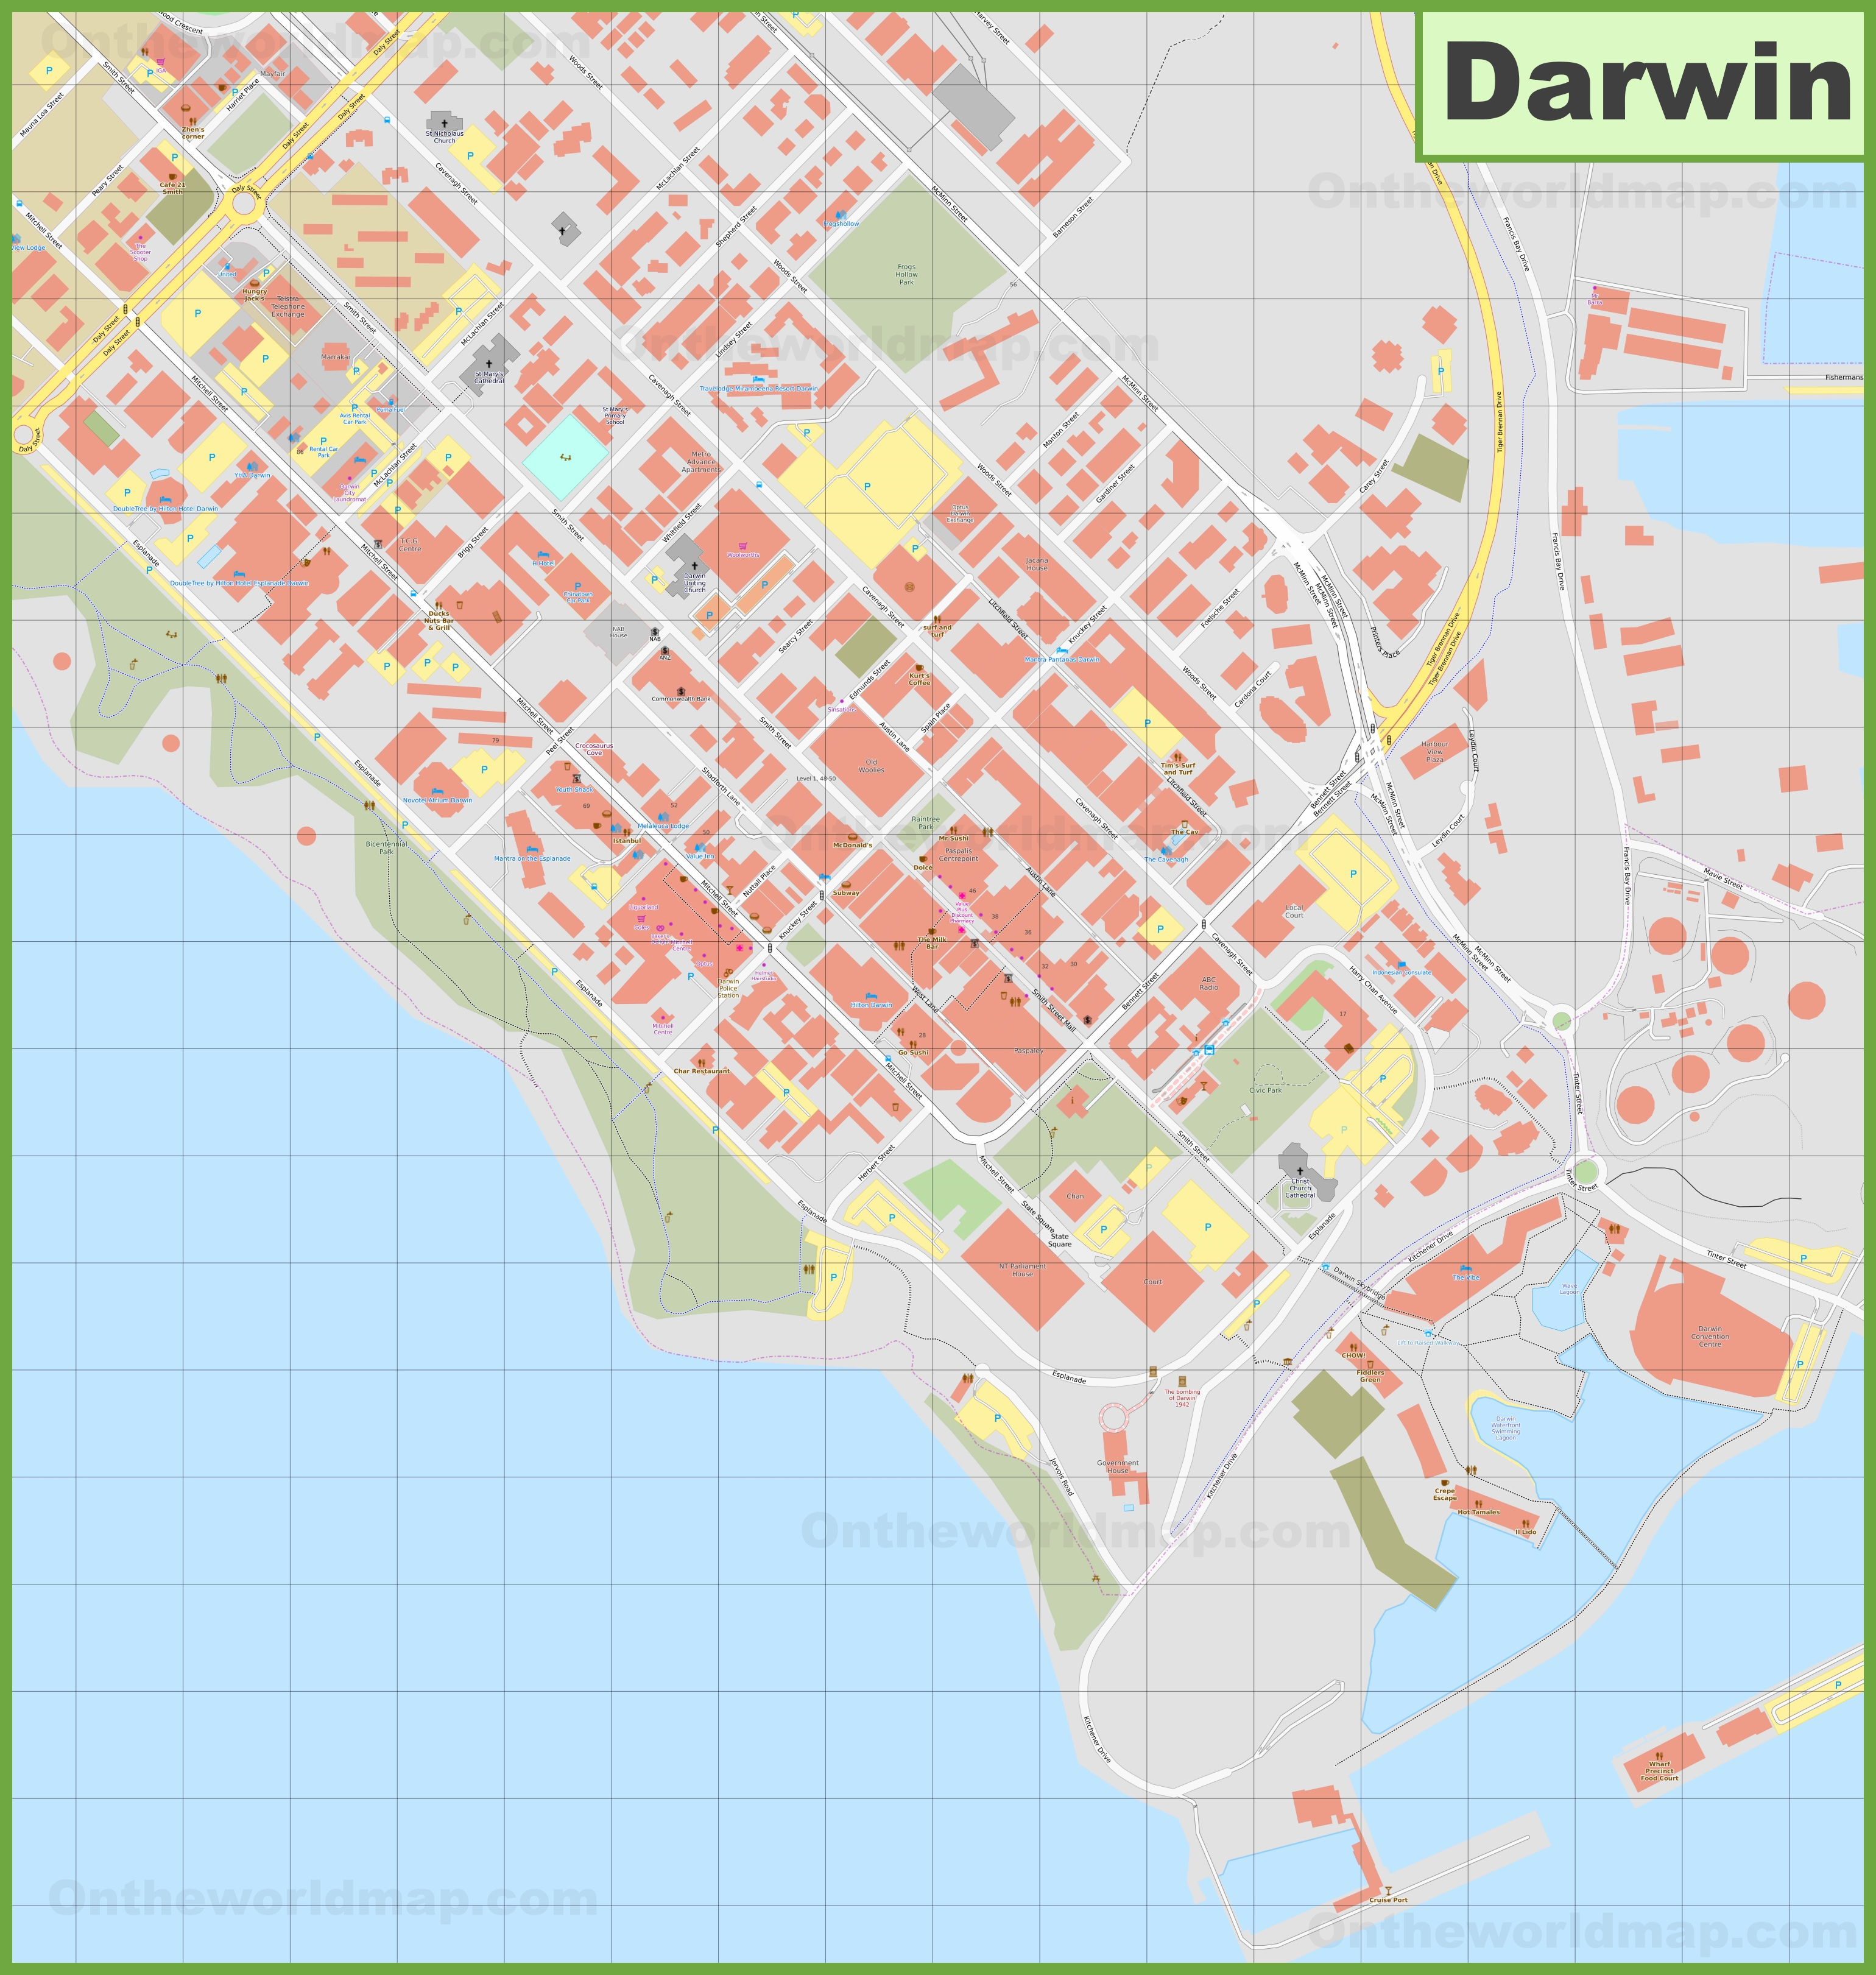 Darwin CBD map